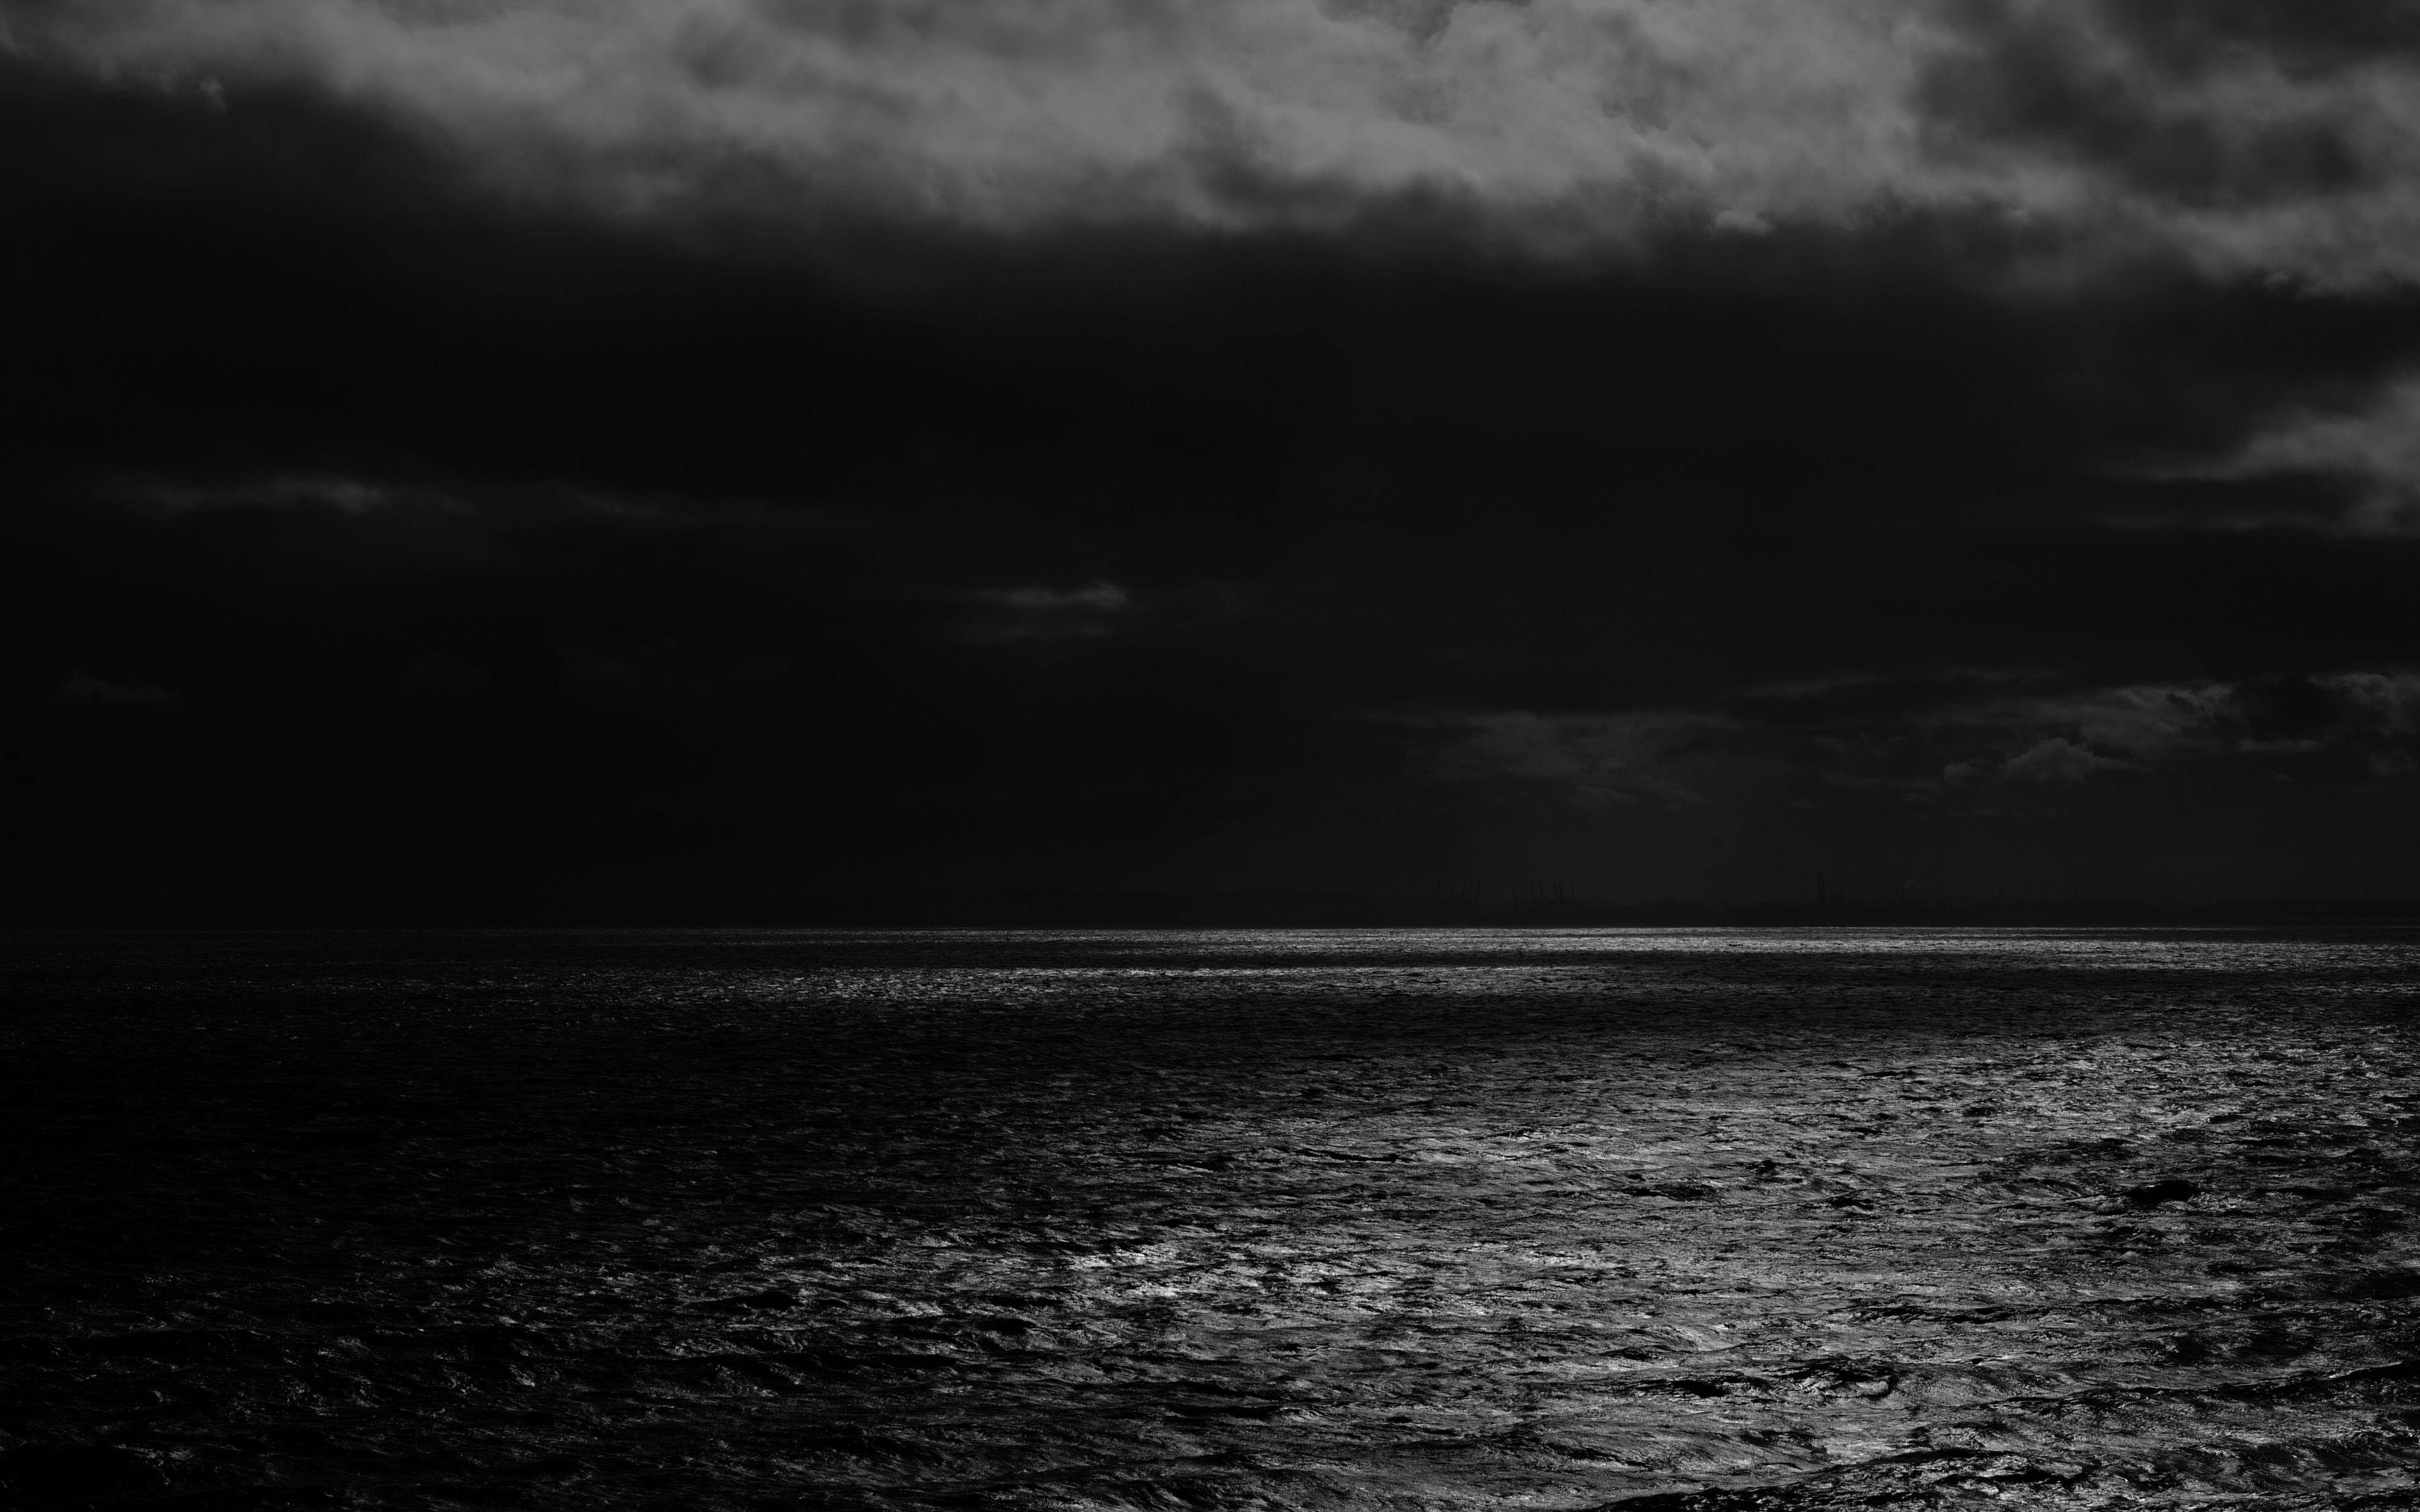 3840x2400 Wallpaper sea, horizon, bw, overcast, clouds, ripples